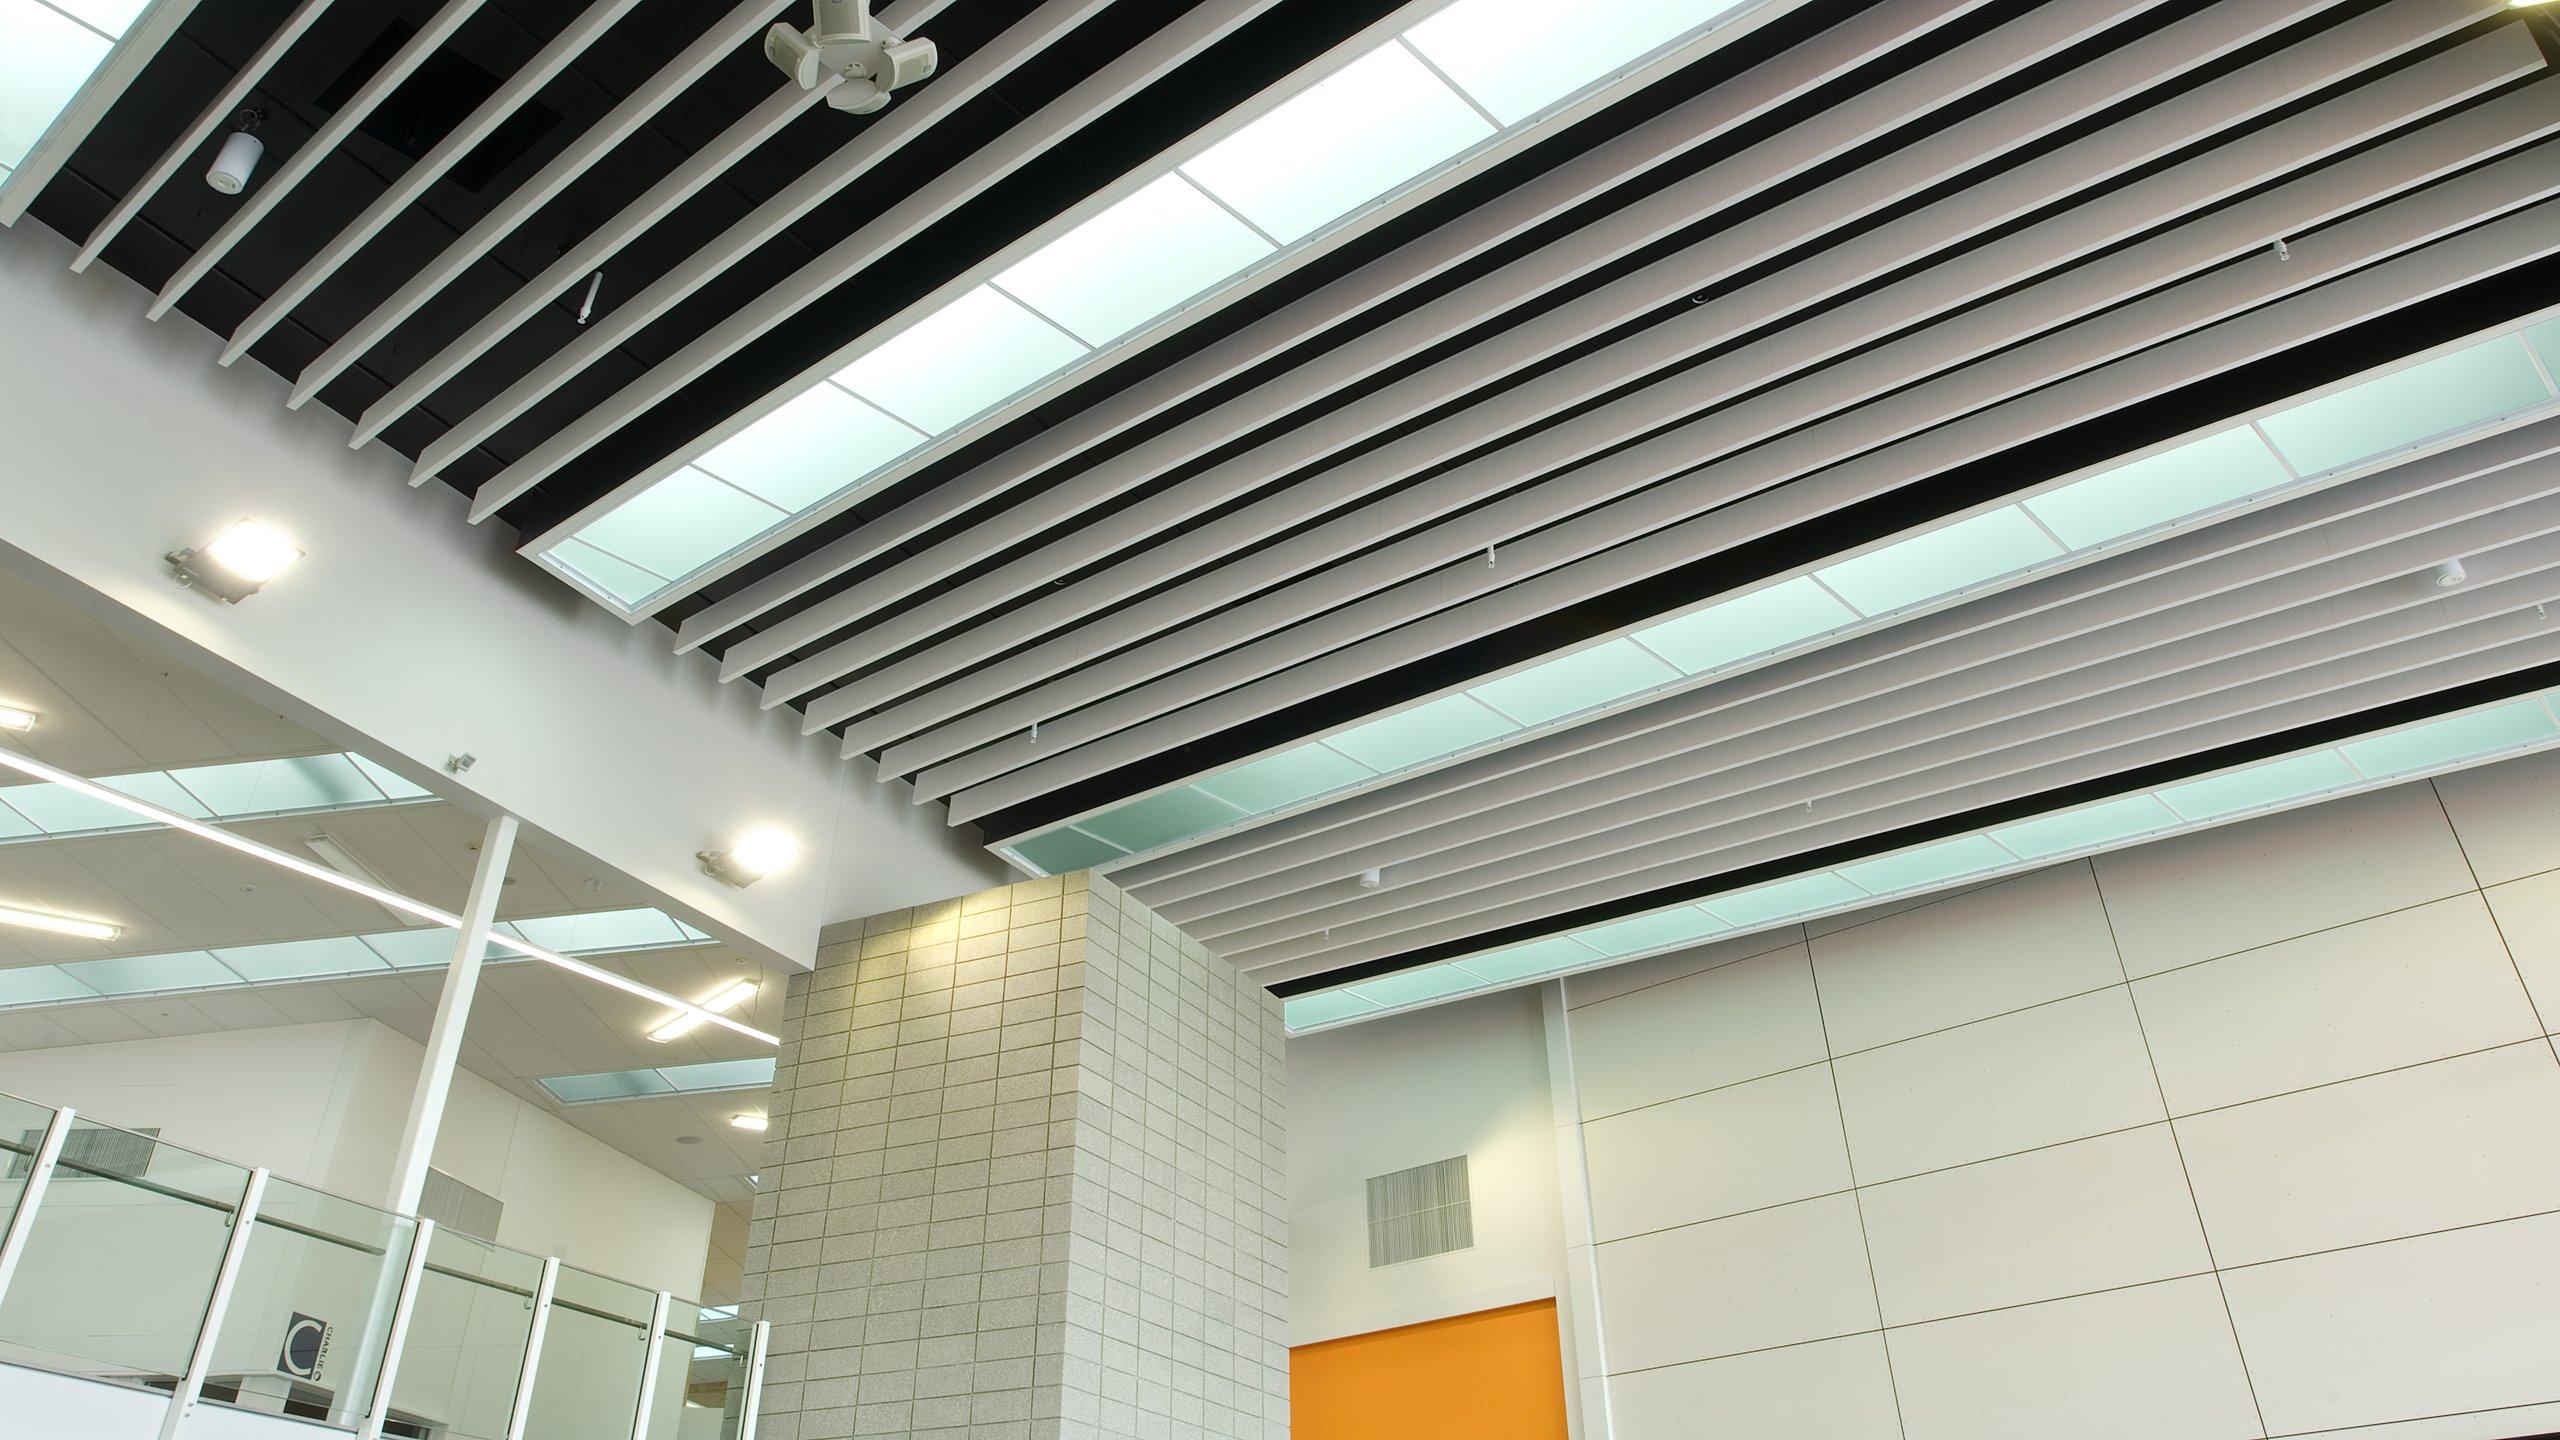 Hobsonville Secondary School Atrium - Baffle Beam